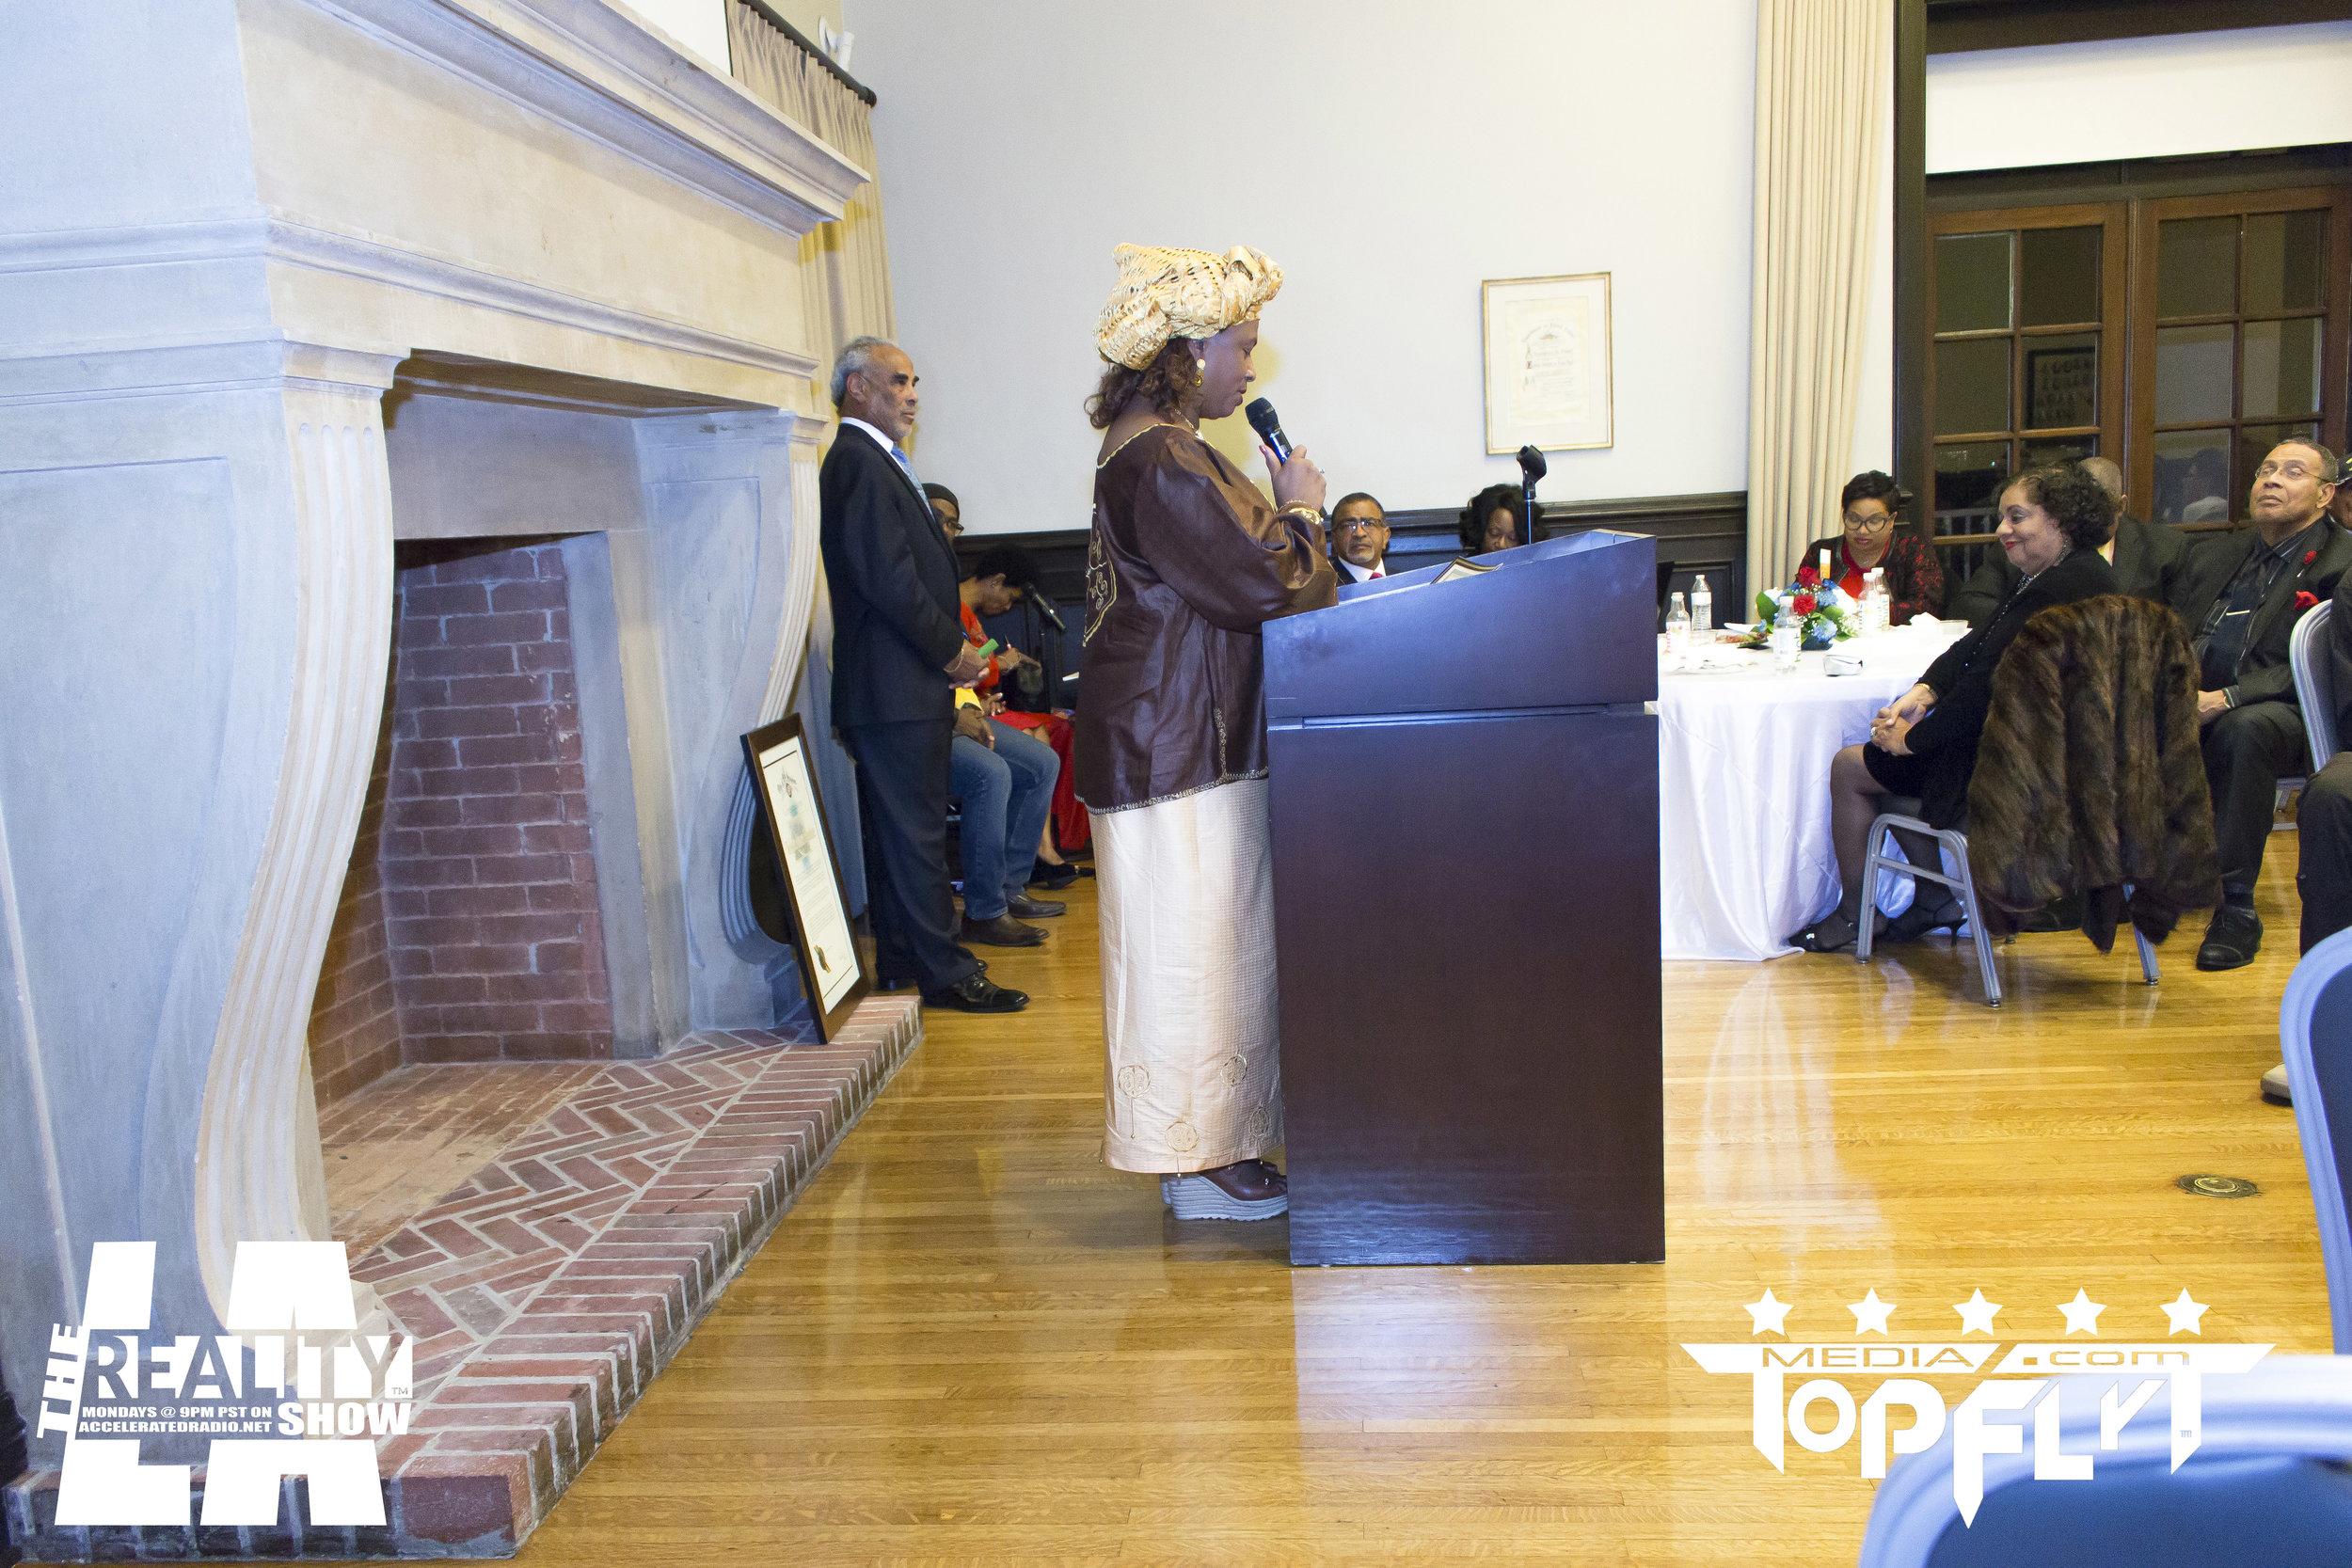 The Reality Show LA - Tuskegee Airmen 75th Anniversary VIP Reception_145.jpg